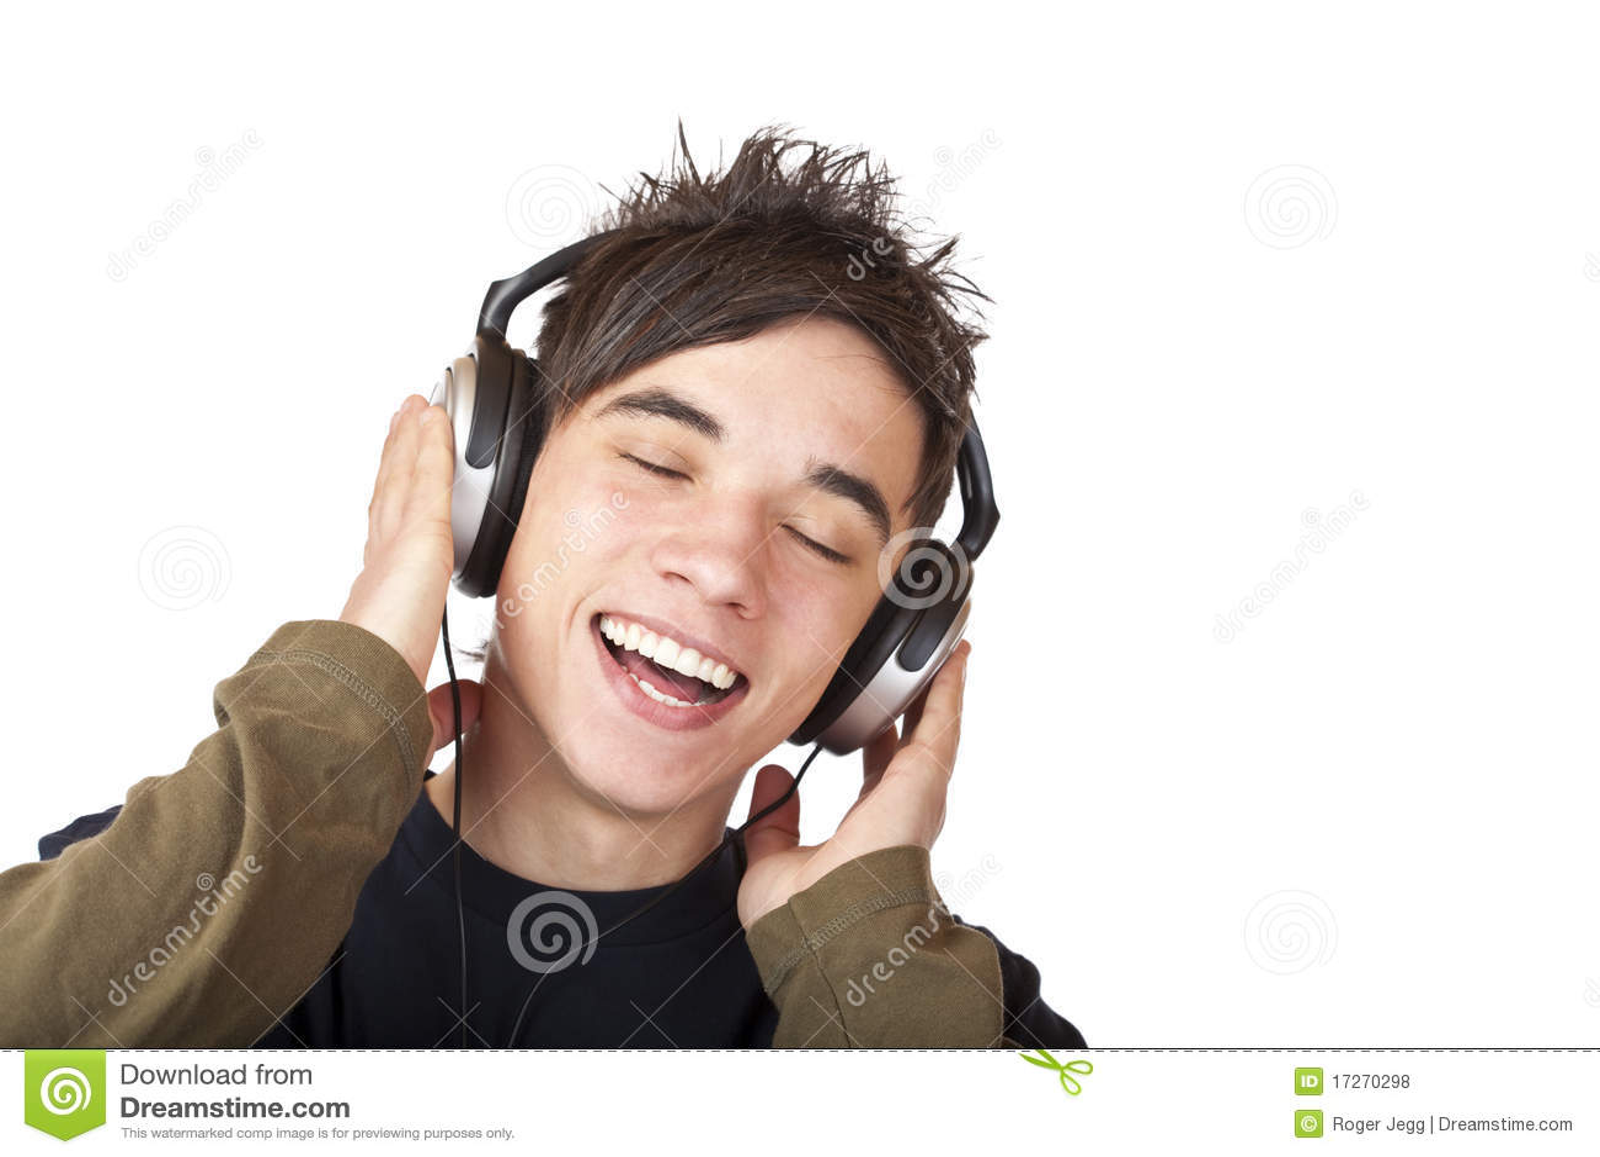 Male Teenager Listening To Music Via Headphones Stock ...